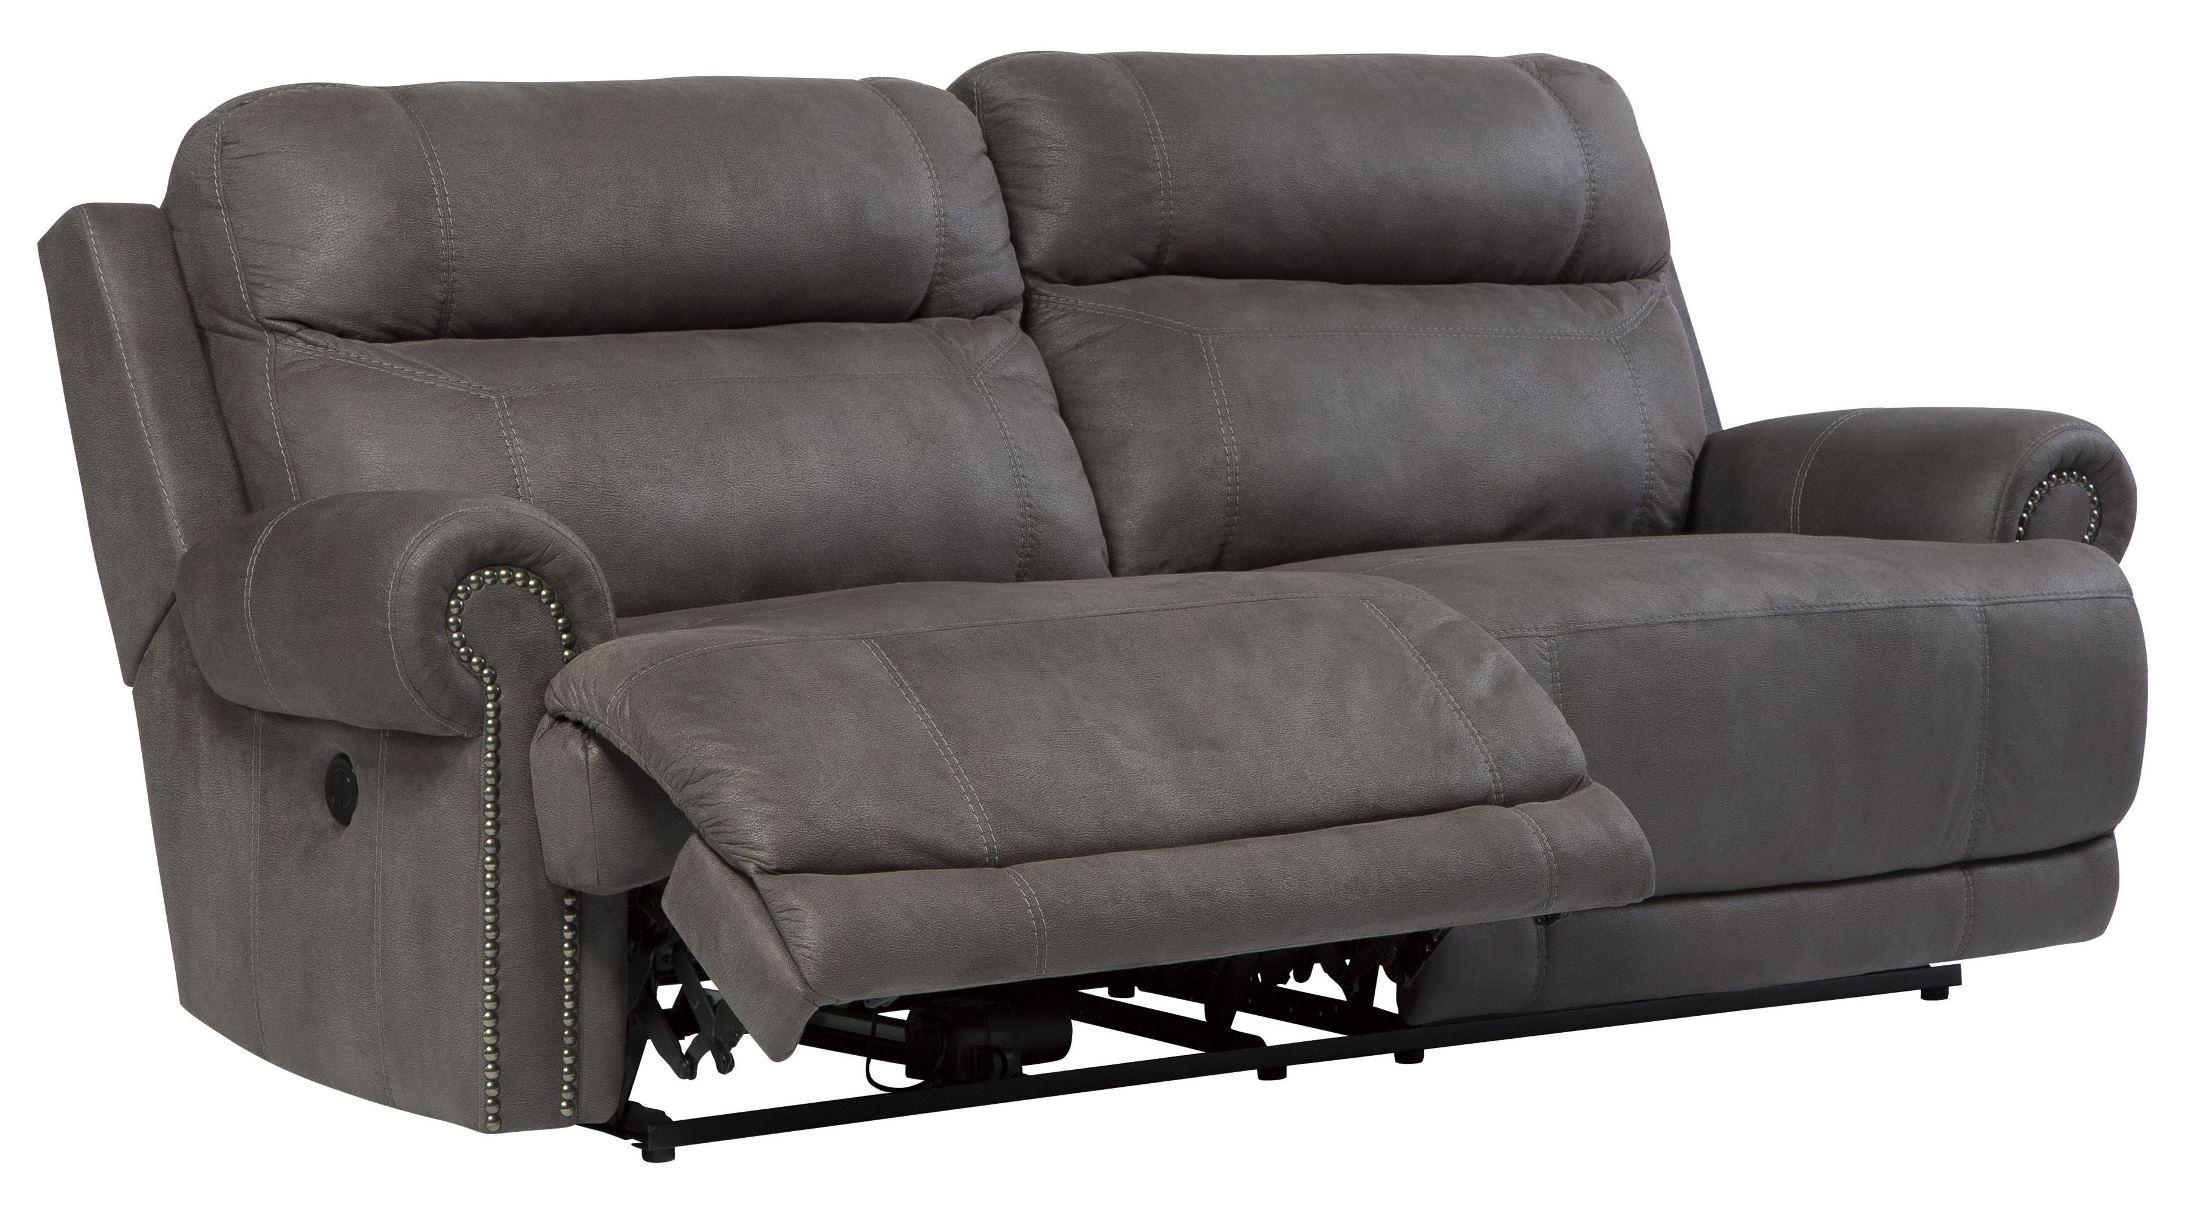 Austere Gray Reclining Sofa  sc 1 st  Coleman Furniture & Austere Gray Reclining Sofa from Ashley (3840181) | Coleman Furniture islam-shia.org